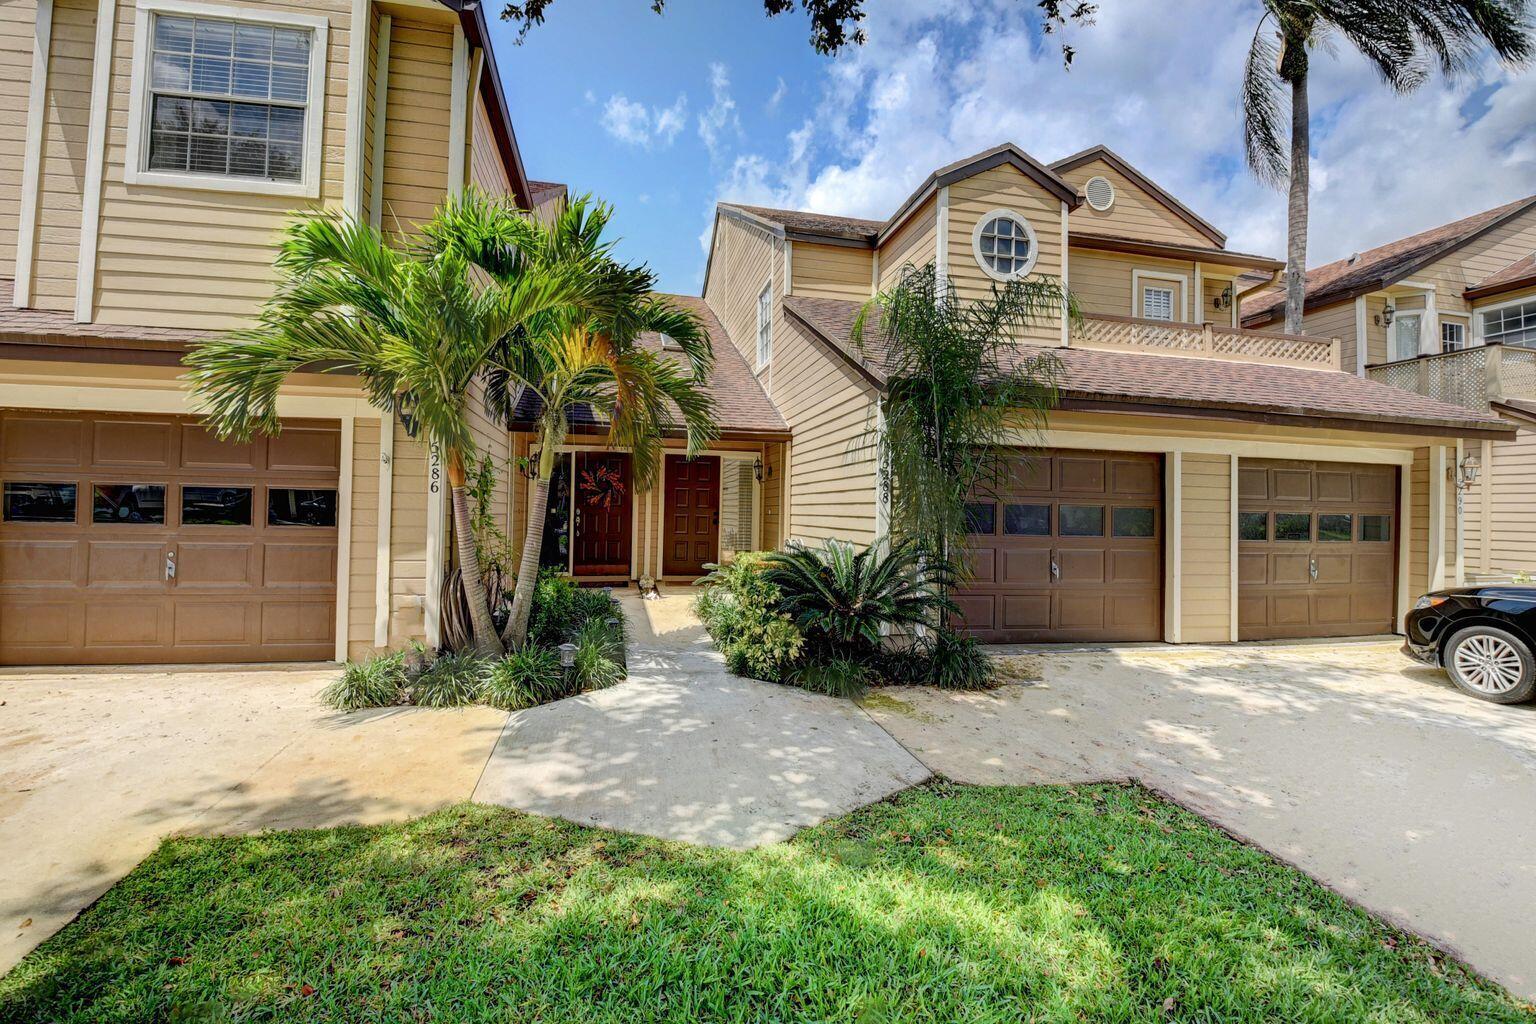 5288 Buckhead Circle 2020 Boca Raton, FL 33486